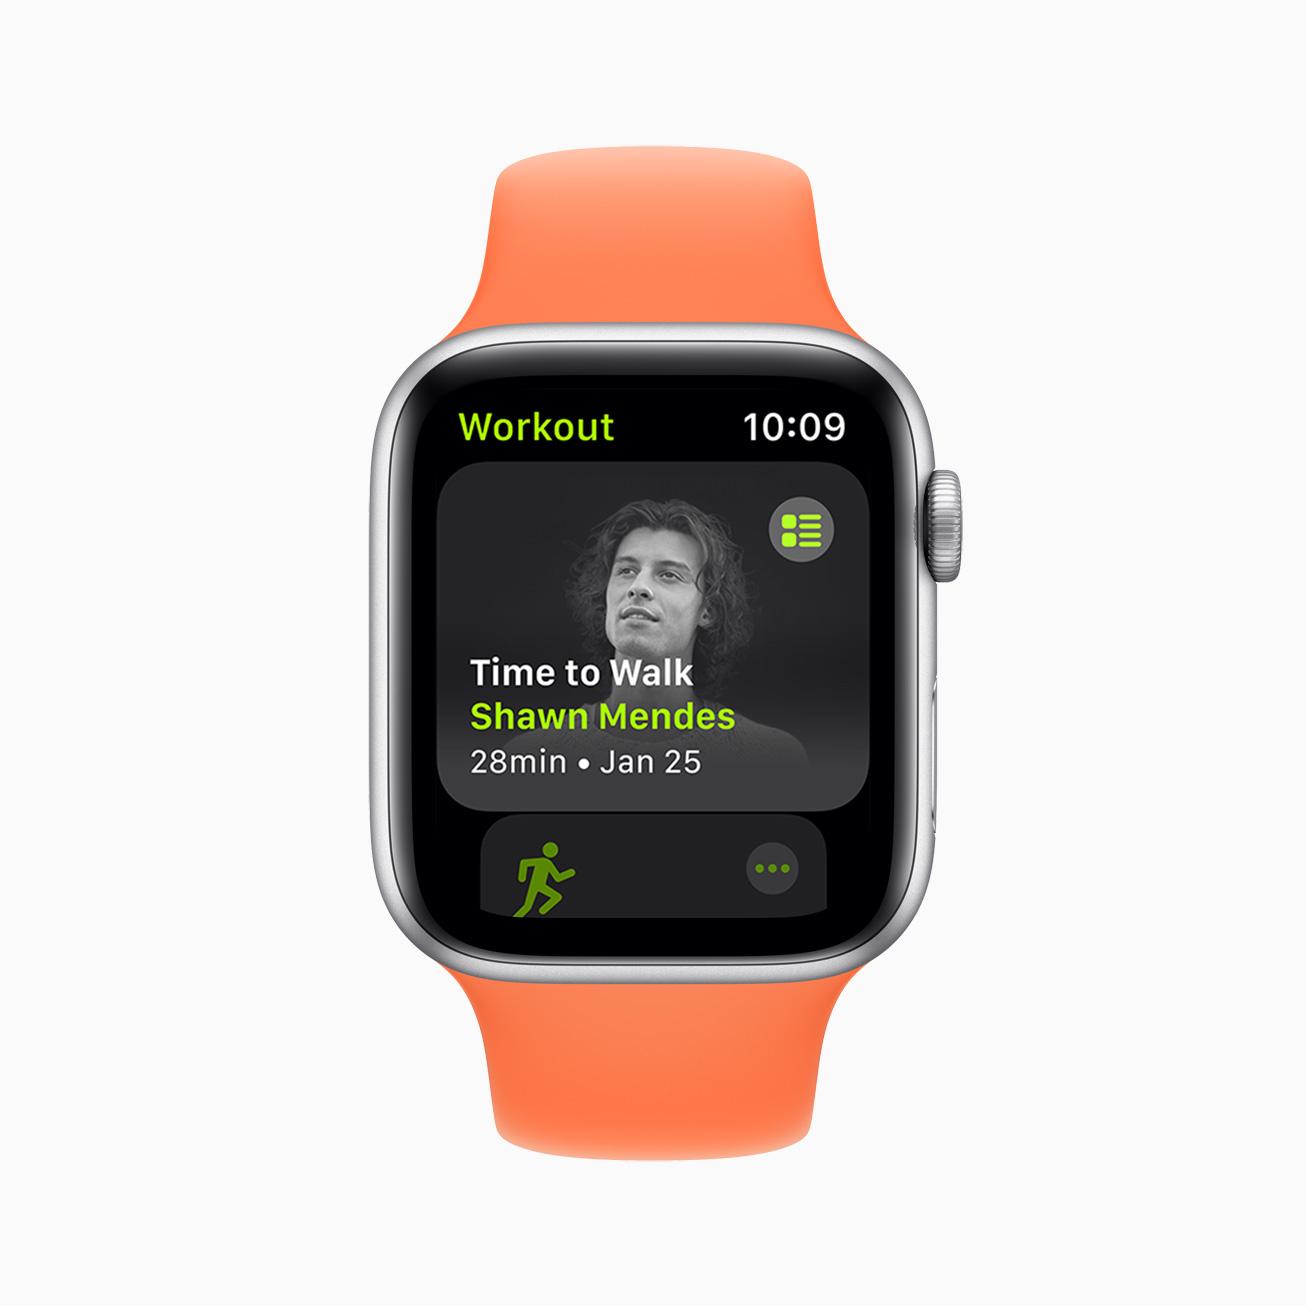 apple_time-to-walk_apple-watch-shawn-mendes_01252021_carousel.jpg.large_2x.jpg